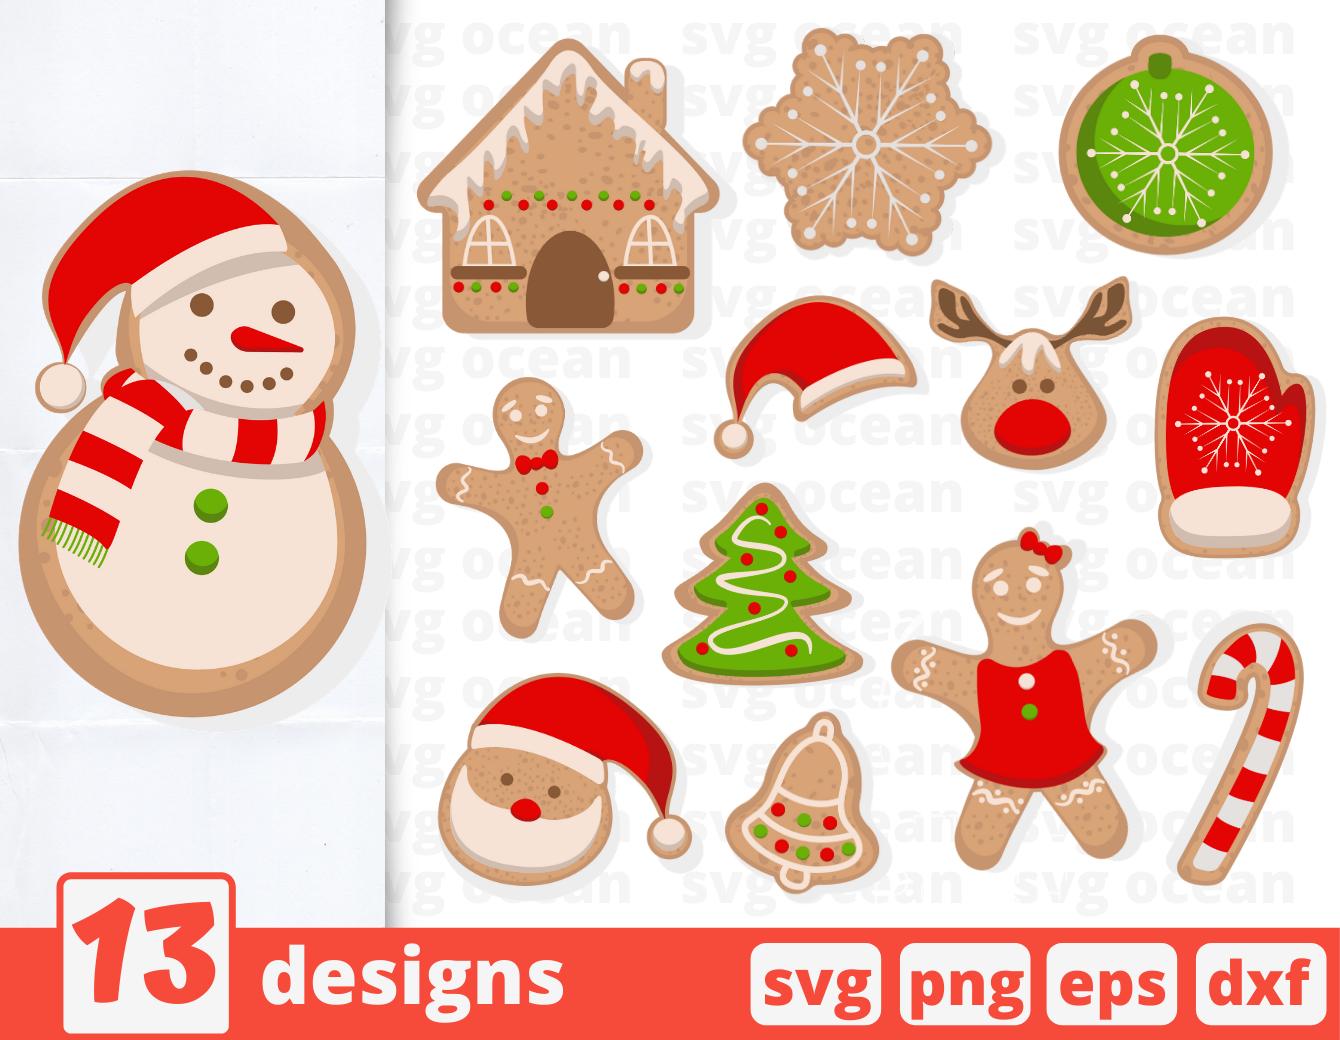 Gingerbread Svg Bundle Christmas Cookies New Year Santa